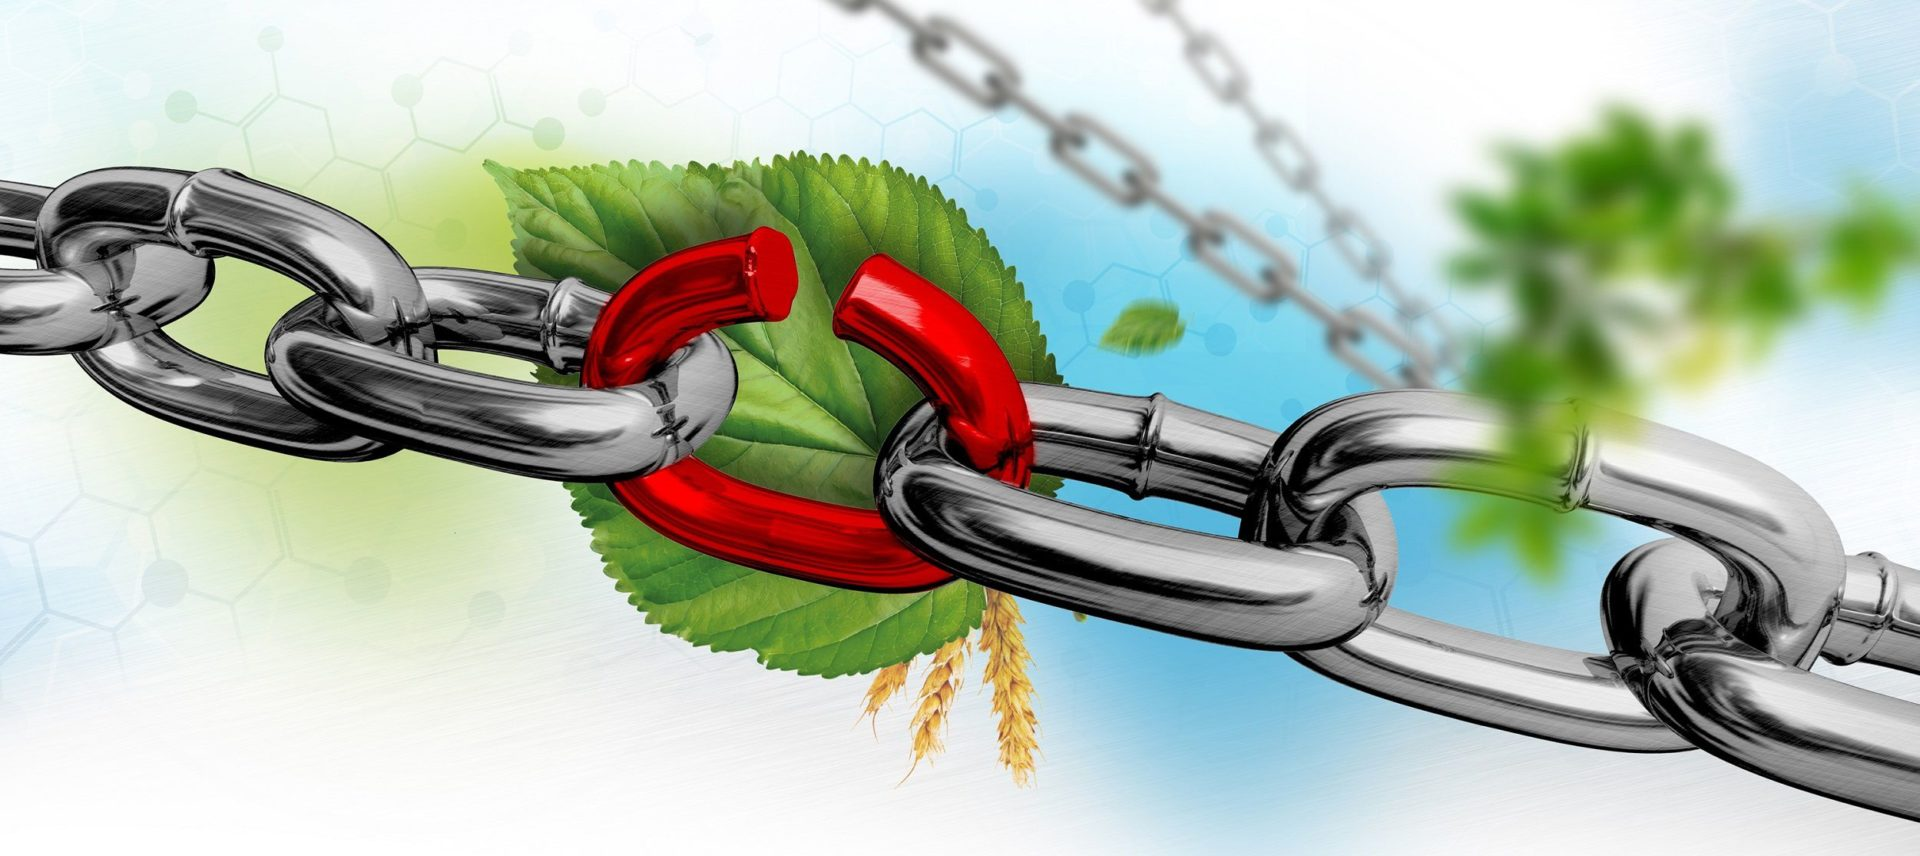 Weak links threaten biobased and circular chains